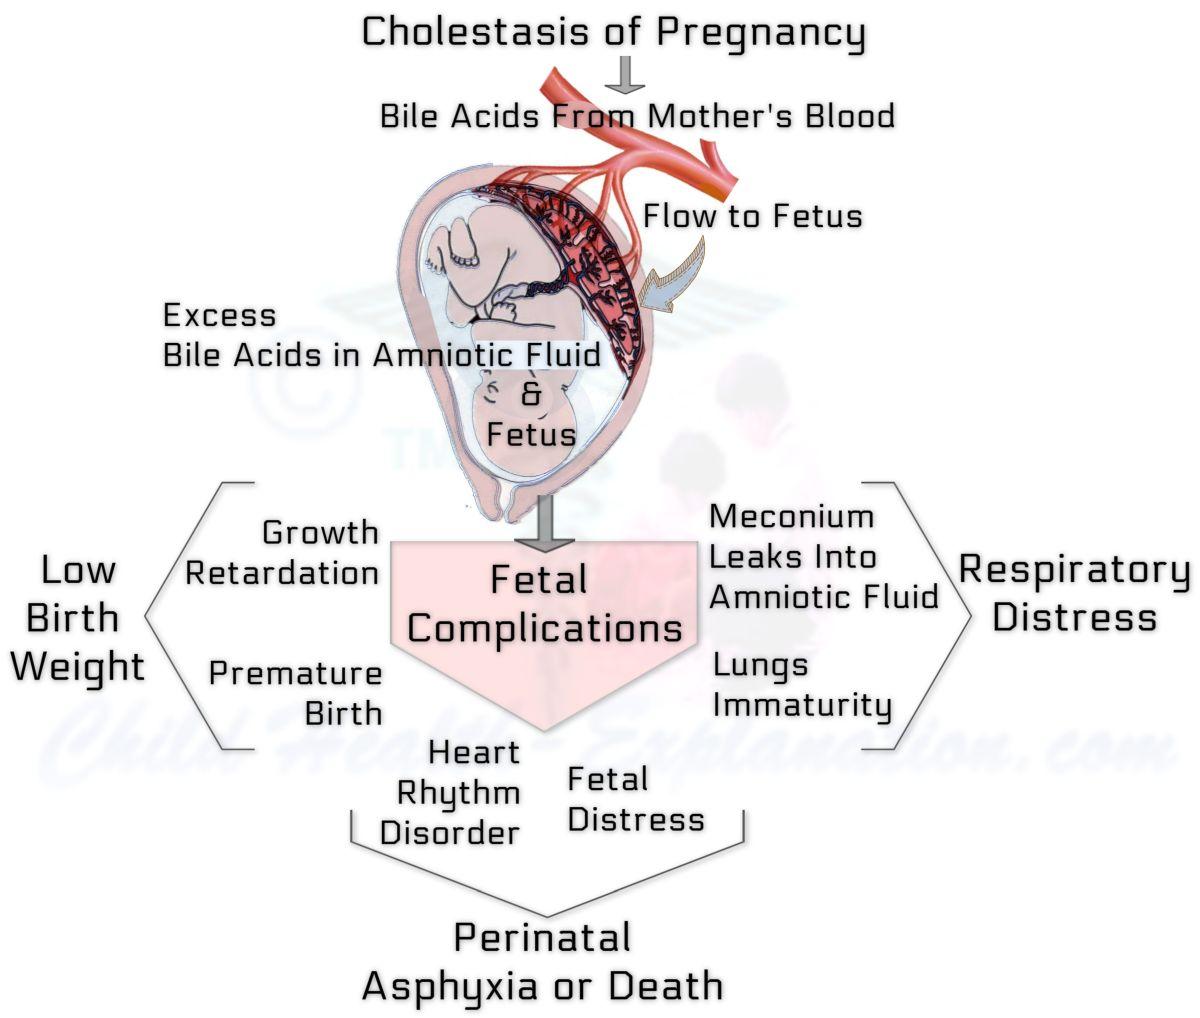 Fetal Complications of Cholestasis of Pregnancy